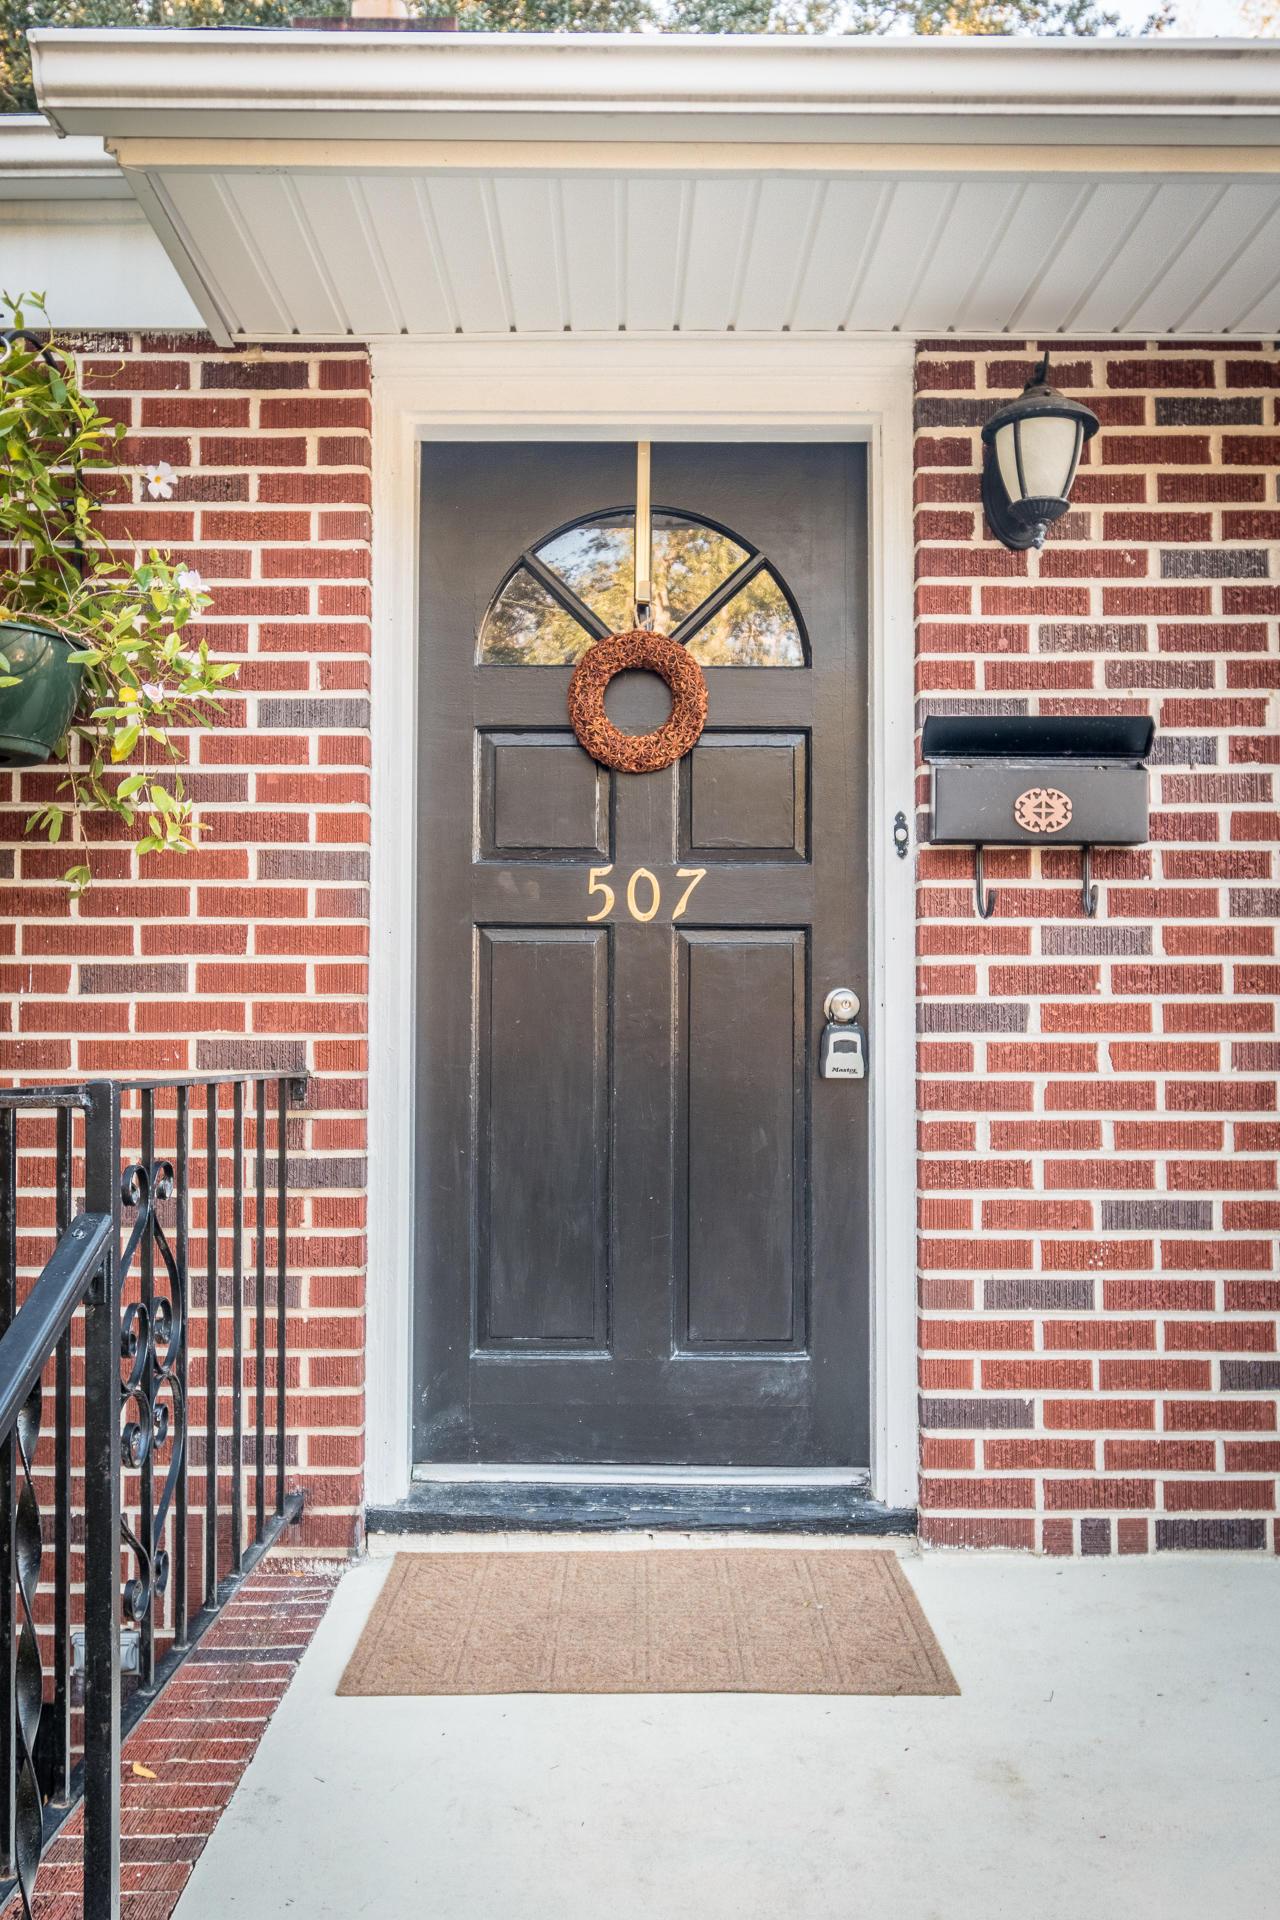 Edgewood Gardens Homes For Sale - 507 Risher, Charleston, SC - 19